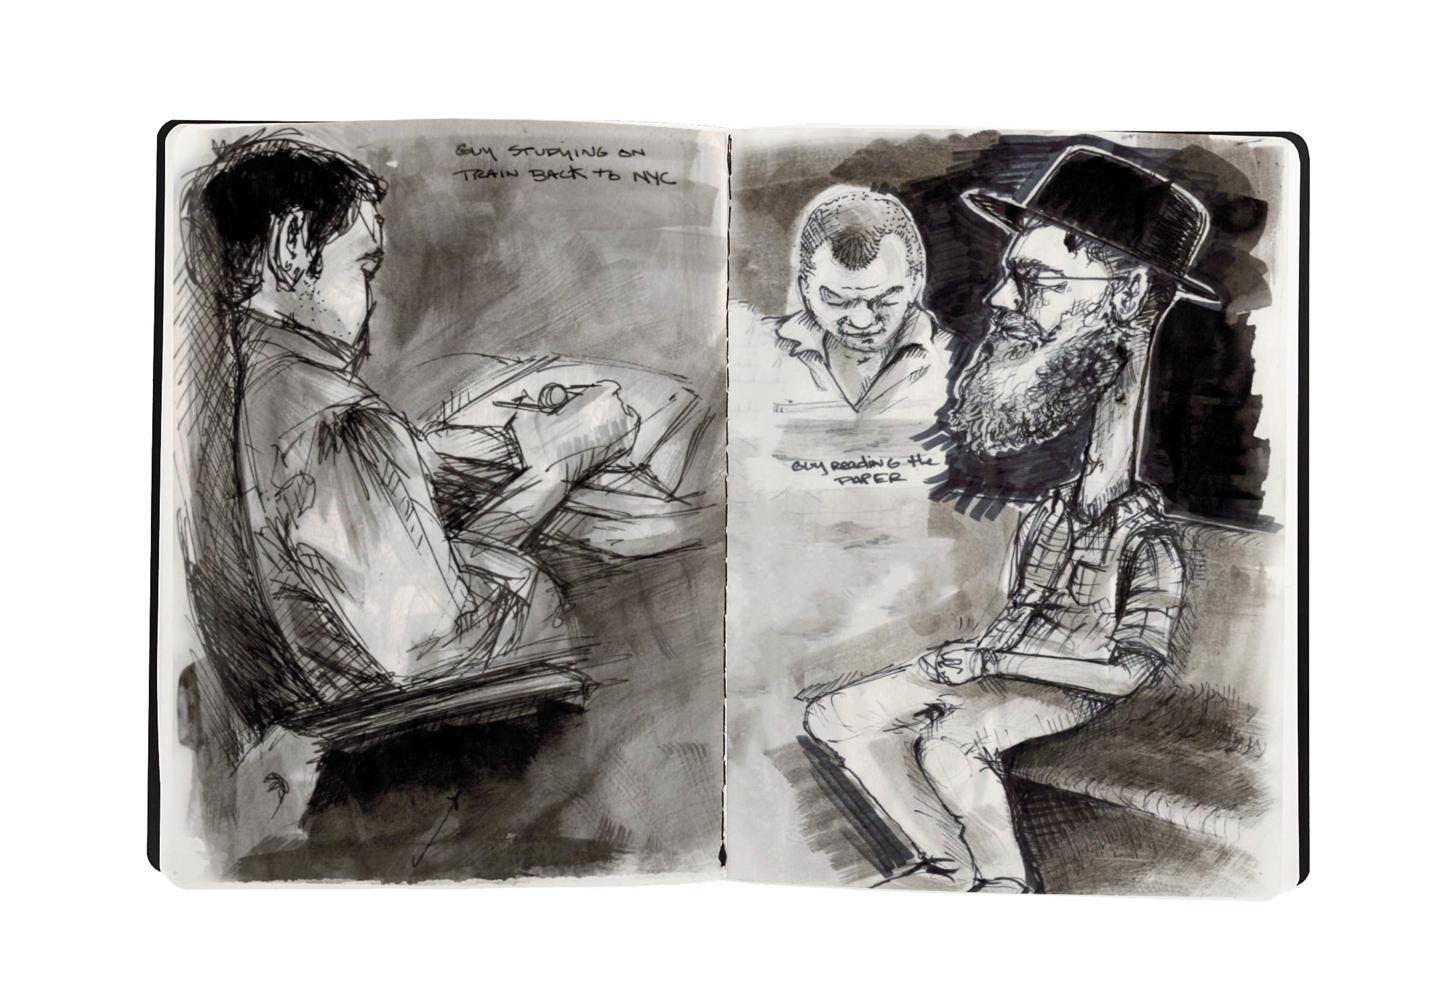 Sketchbook3.png